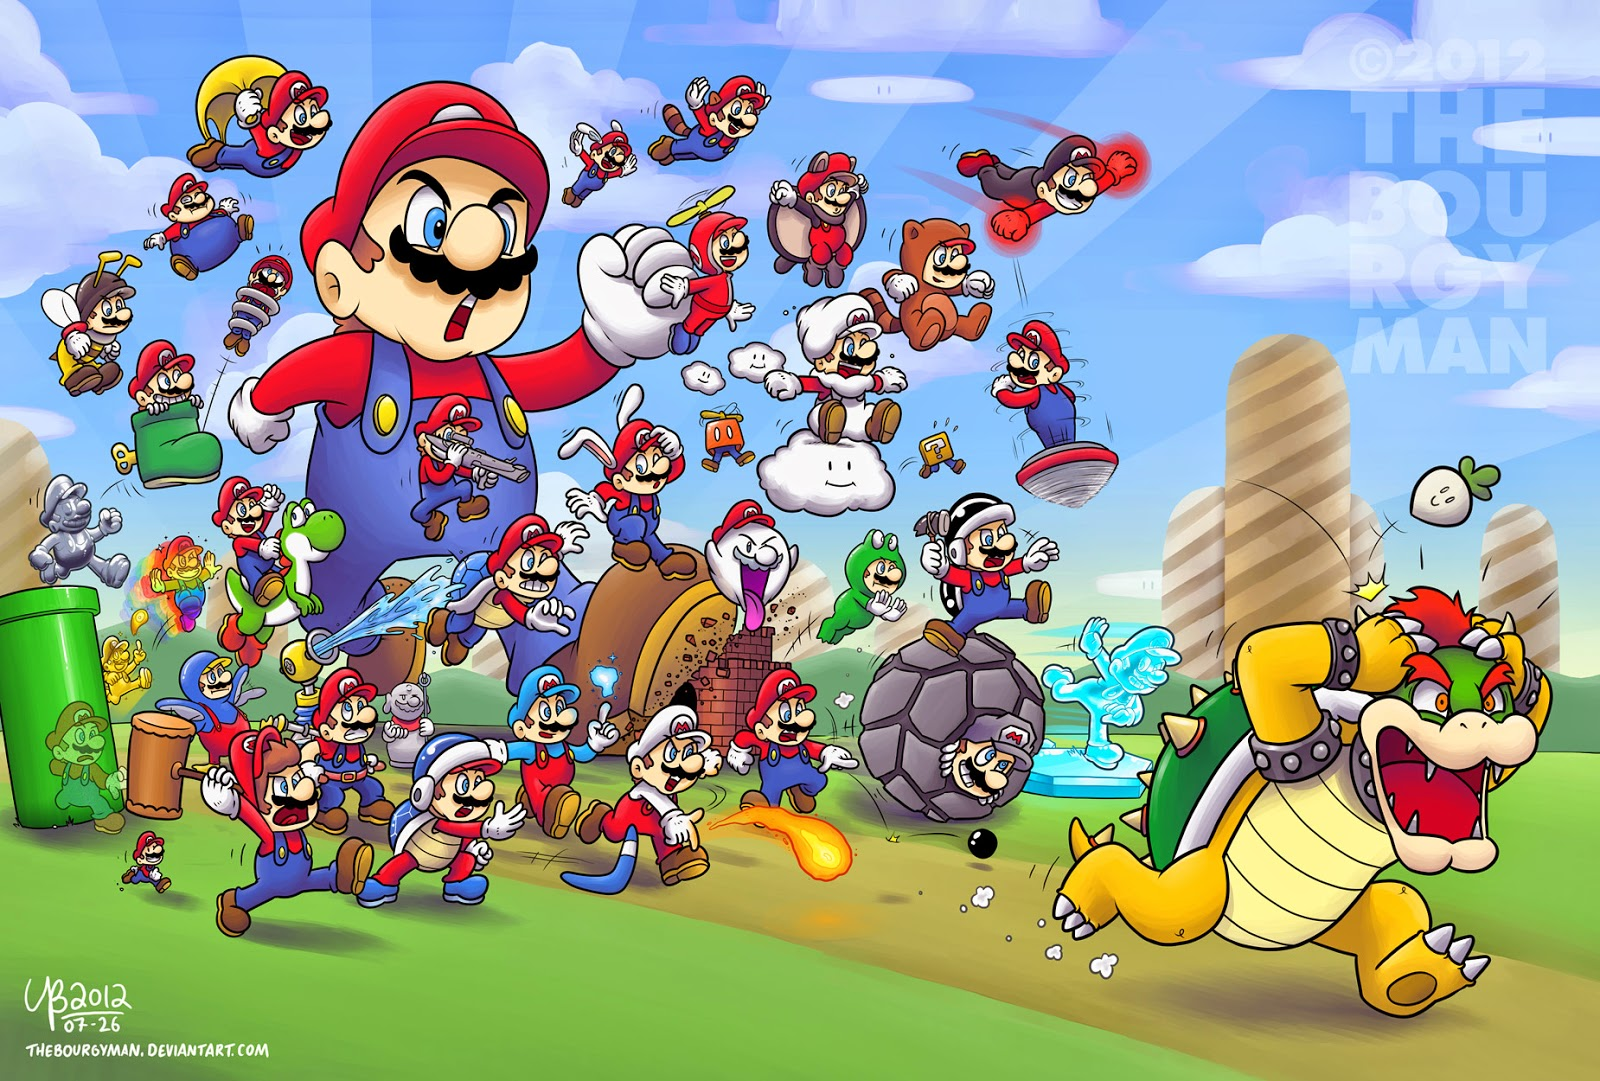 Paper Mario Games - Giant Bomb